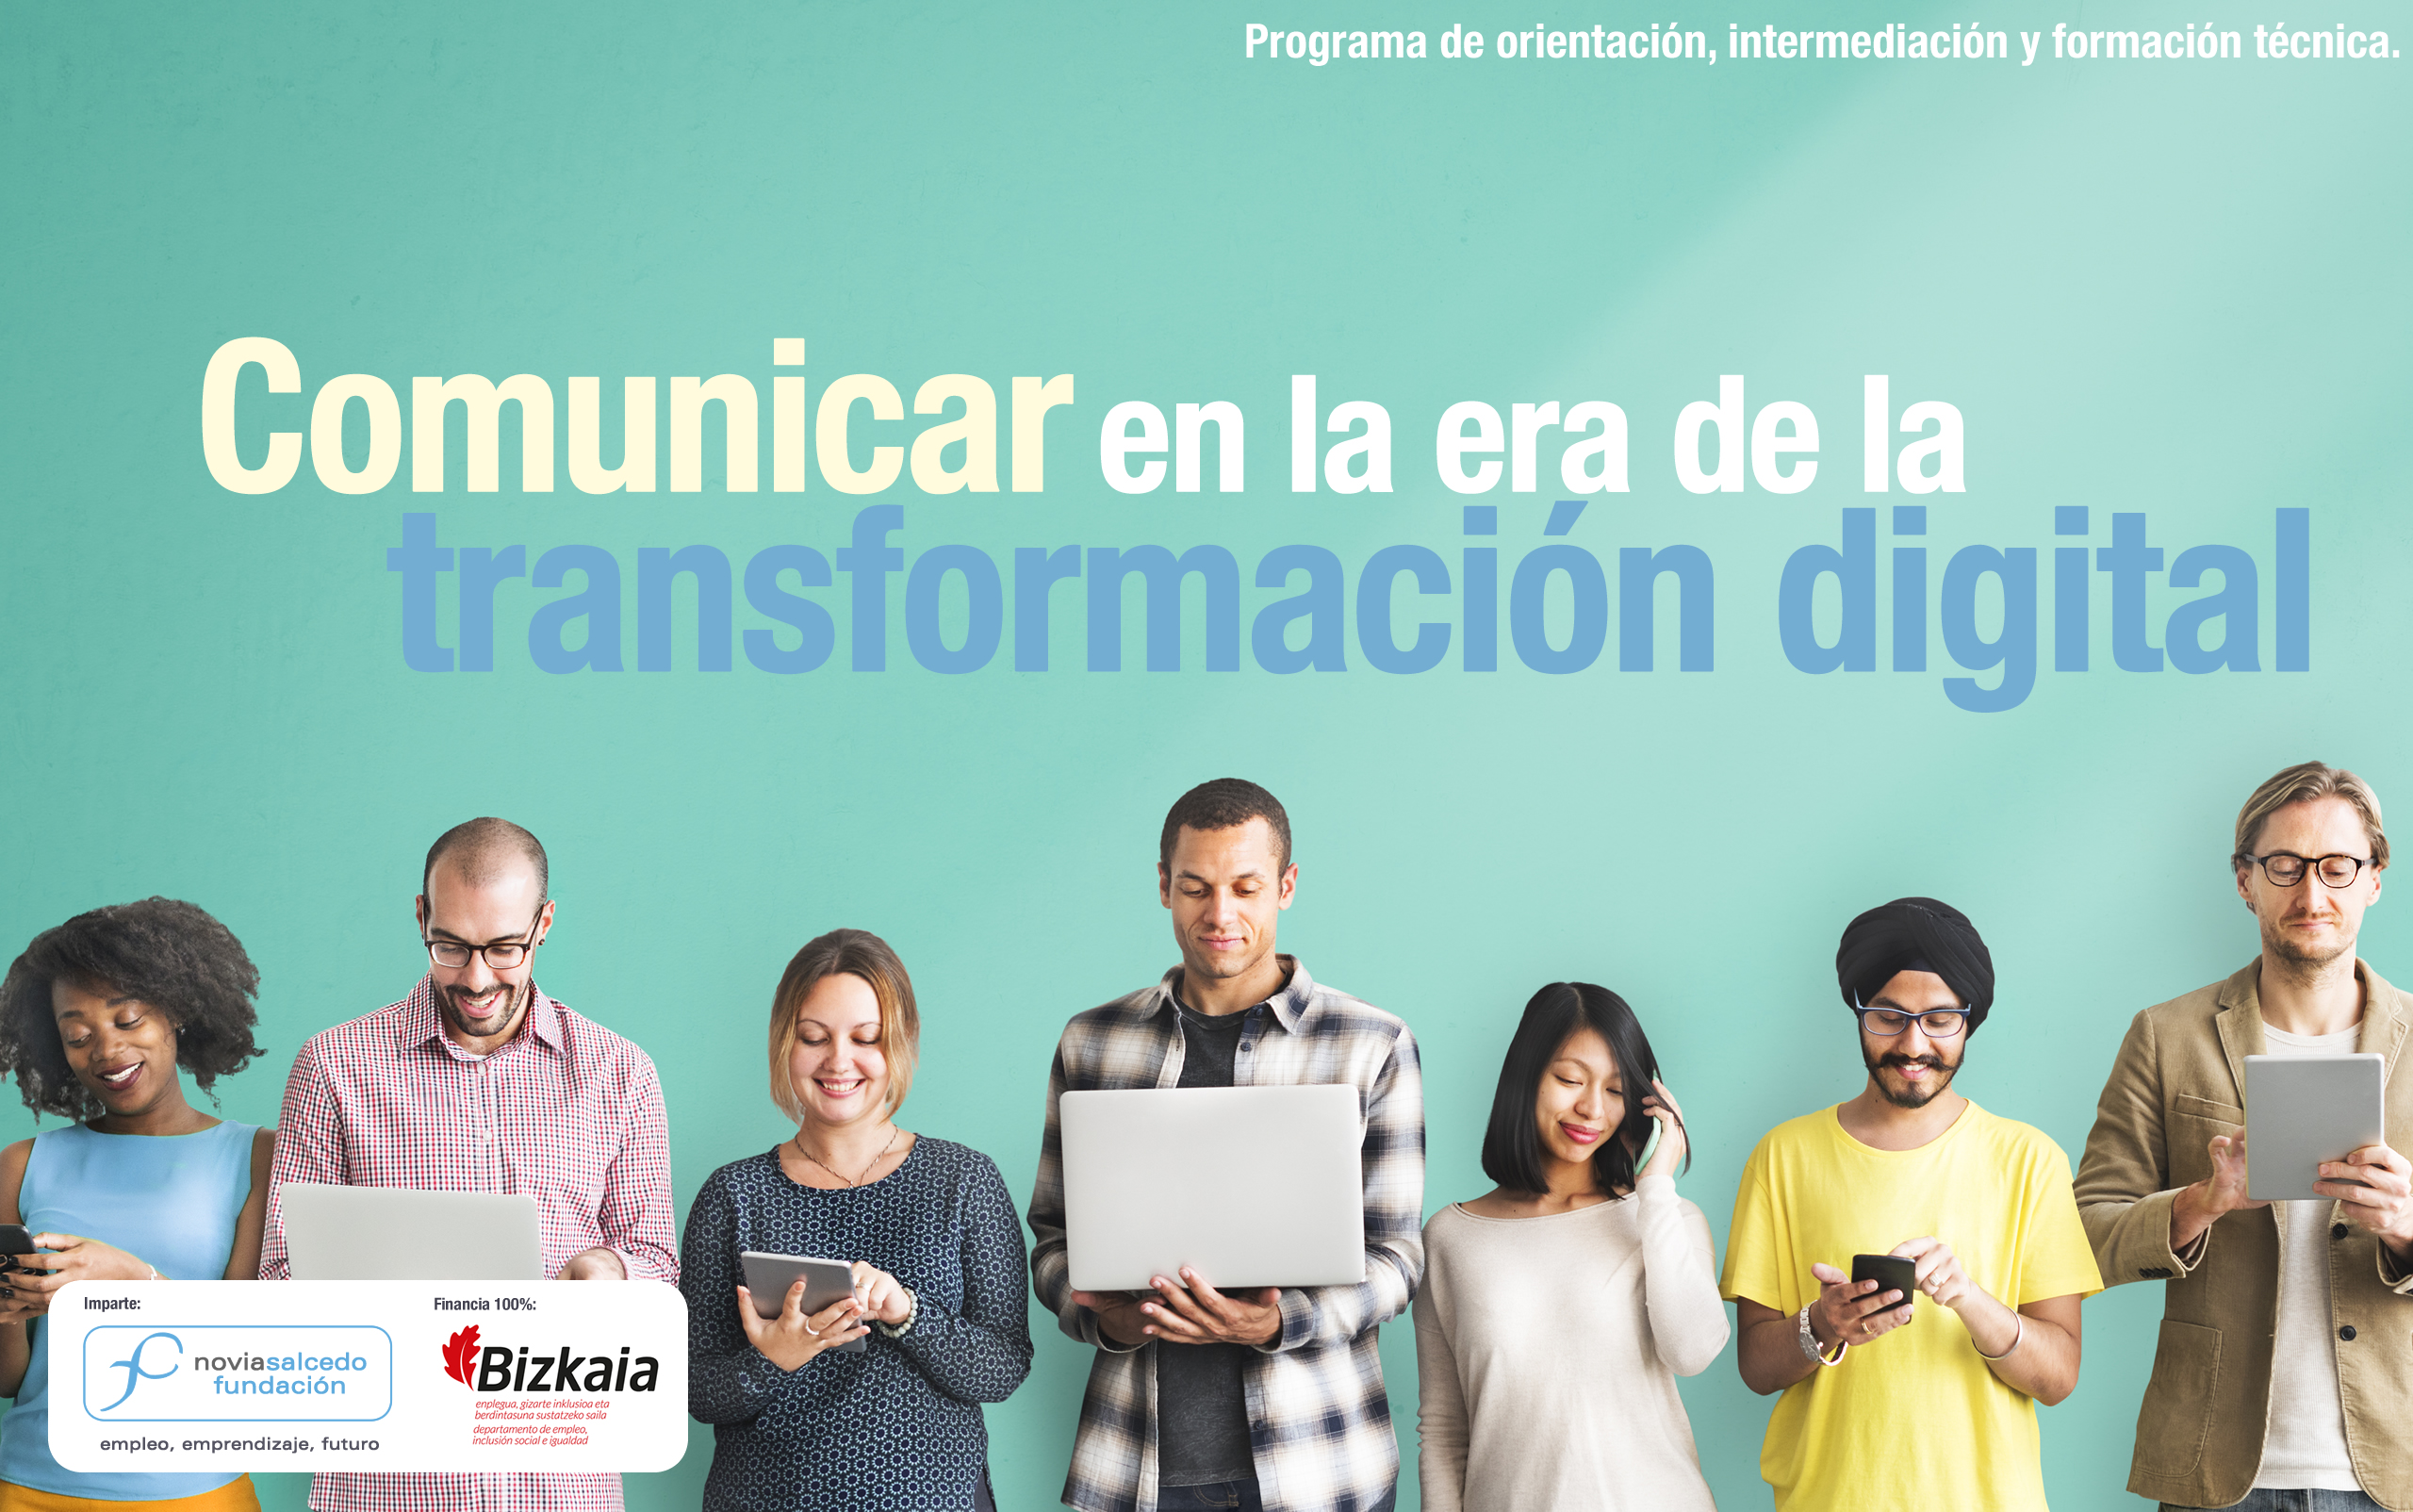 comunicar en la era de la transformacion digital